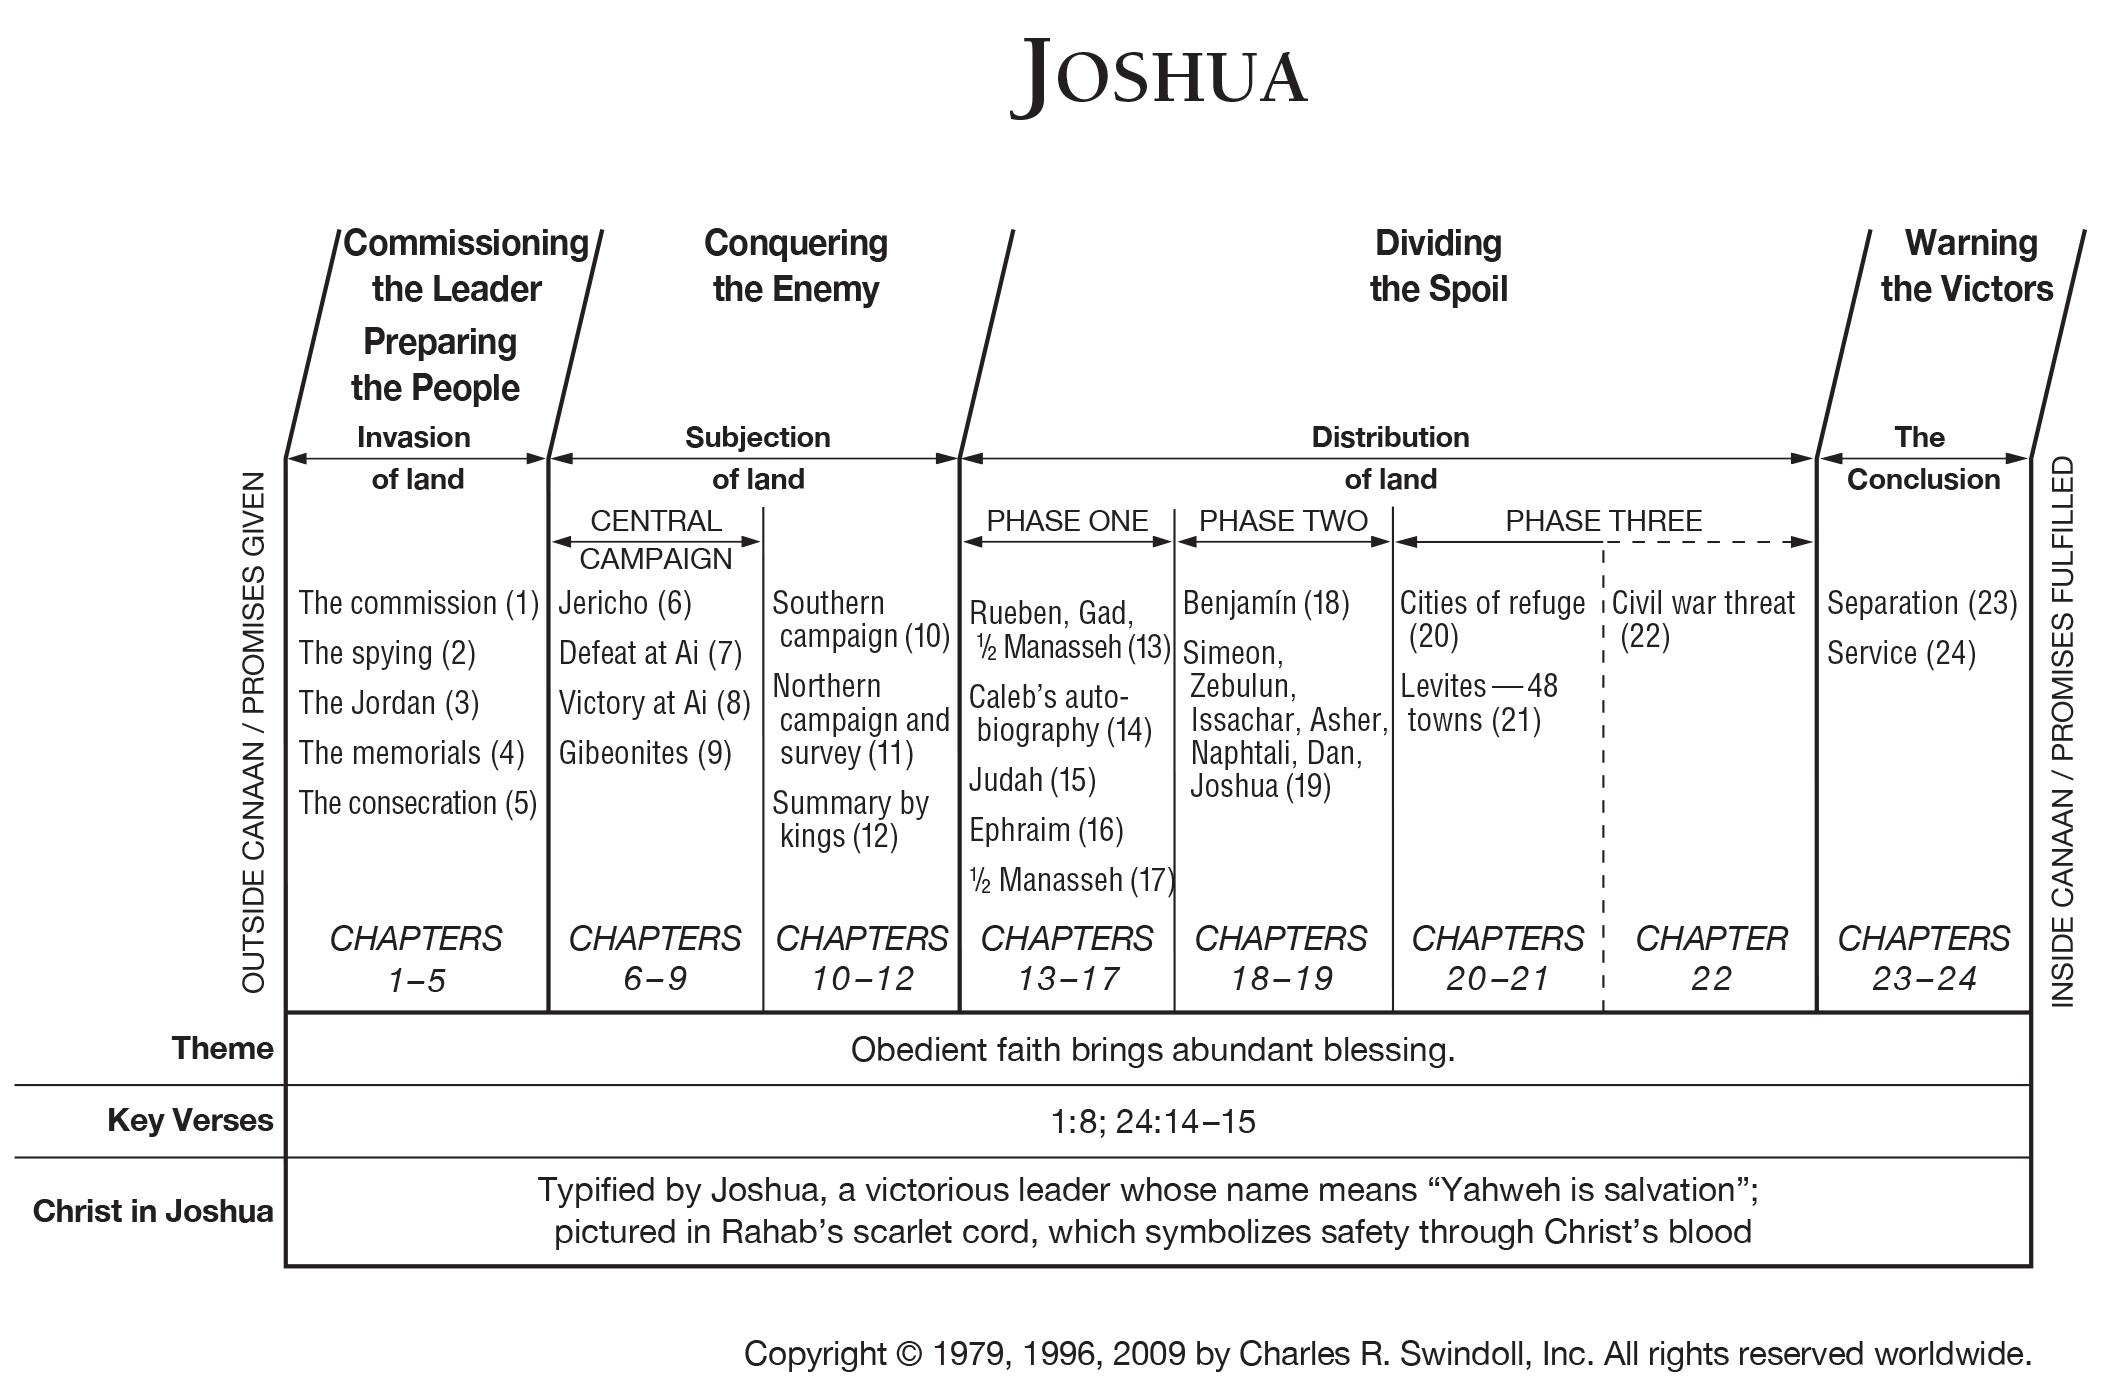 Joshua Study Guide - ttb.org